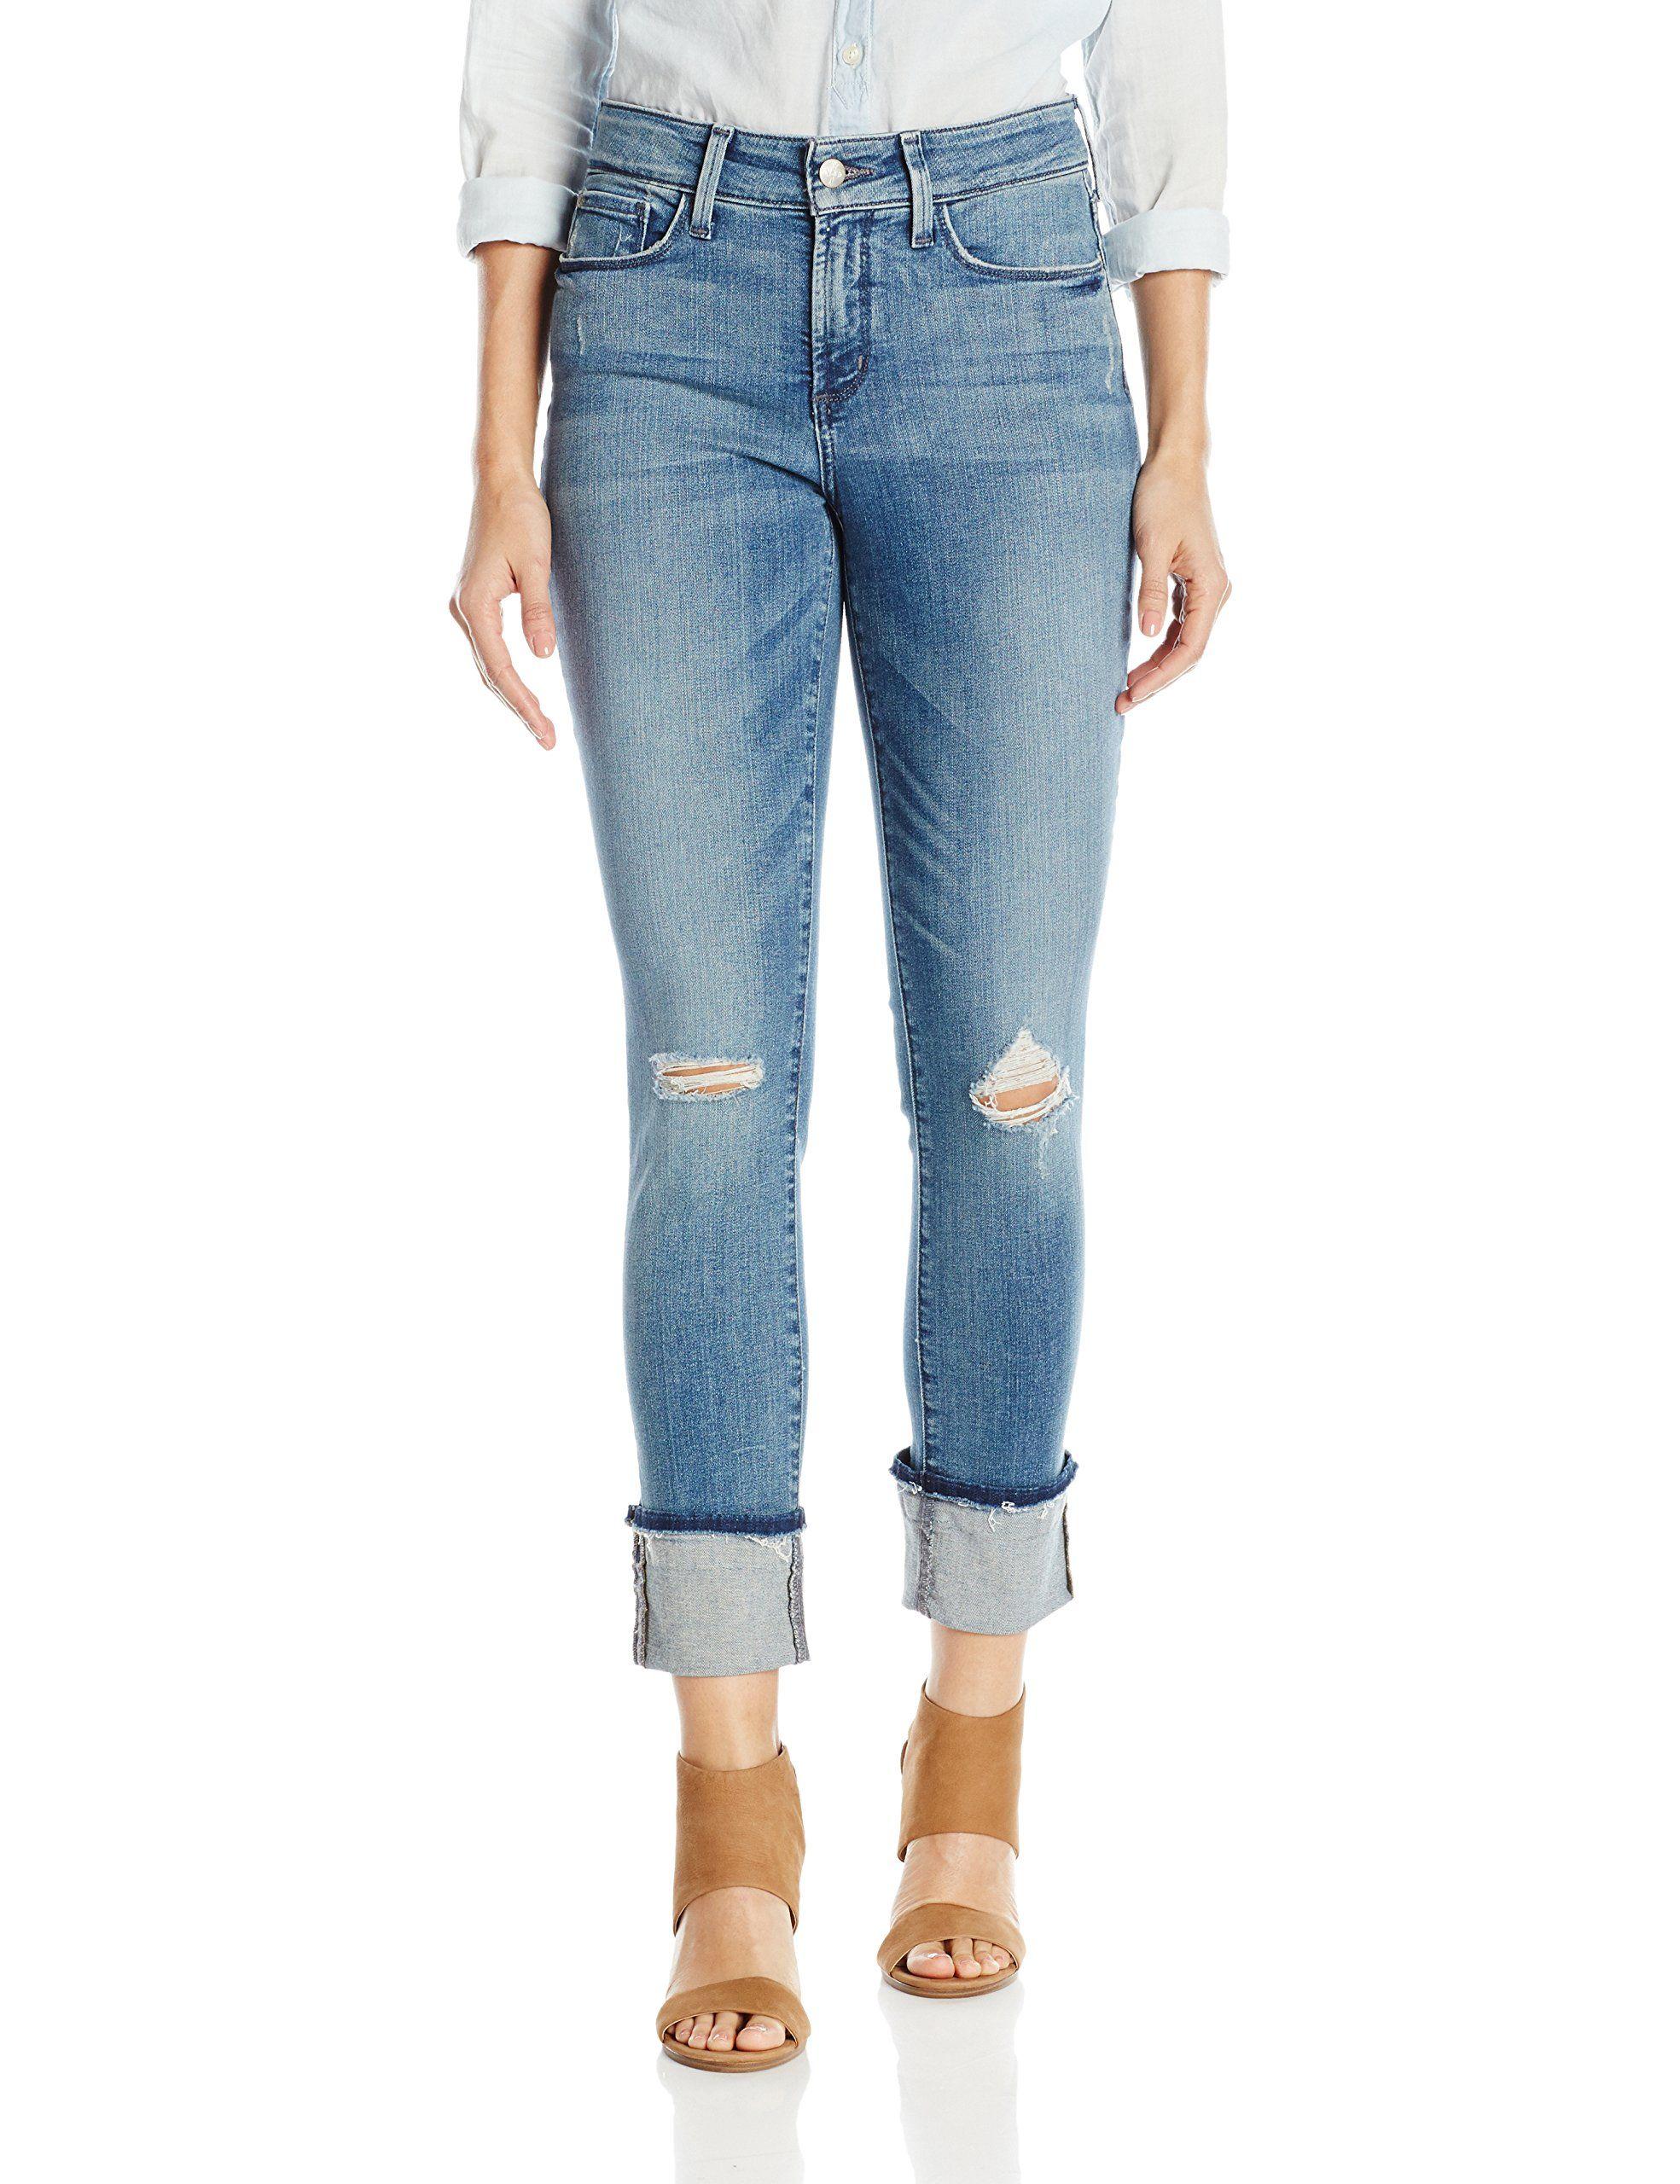 NYDJ Women's Alina Wide Cuff Skinny Ankle Jeans with Frayed Hem, Paloma Rips, 12